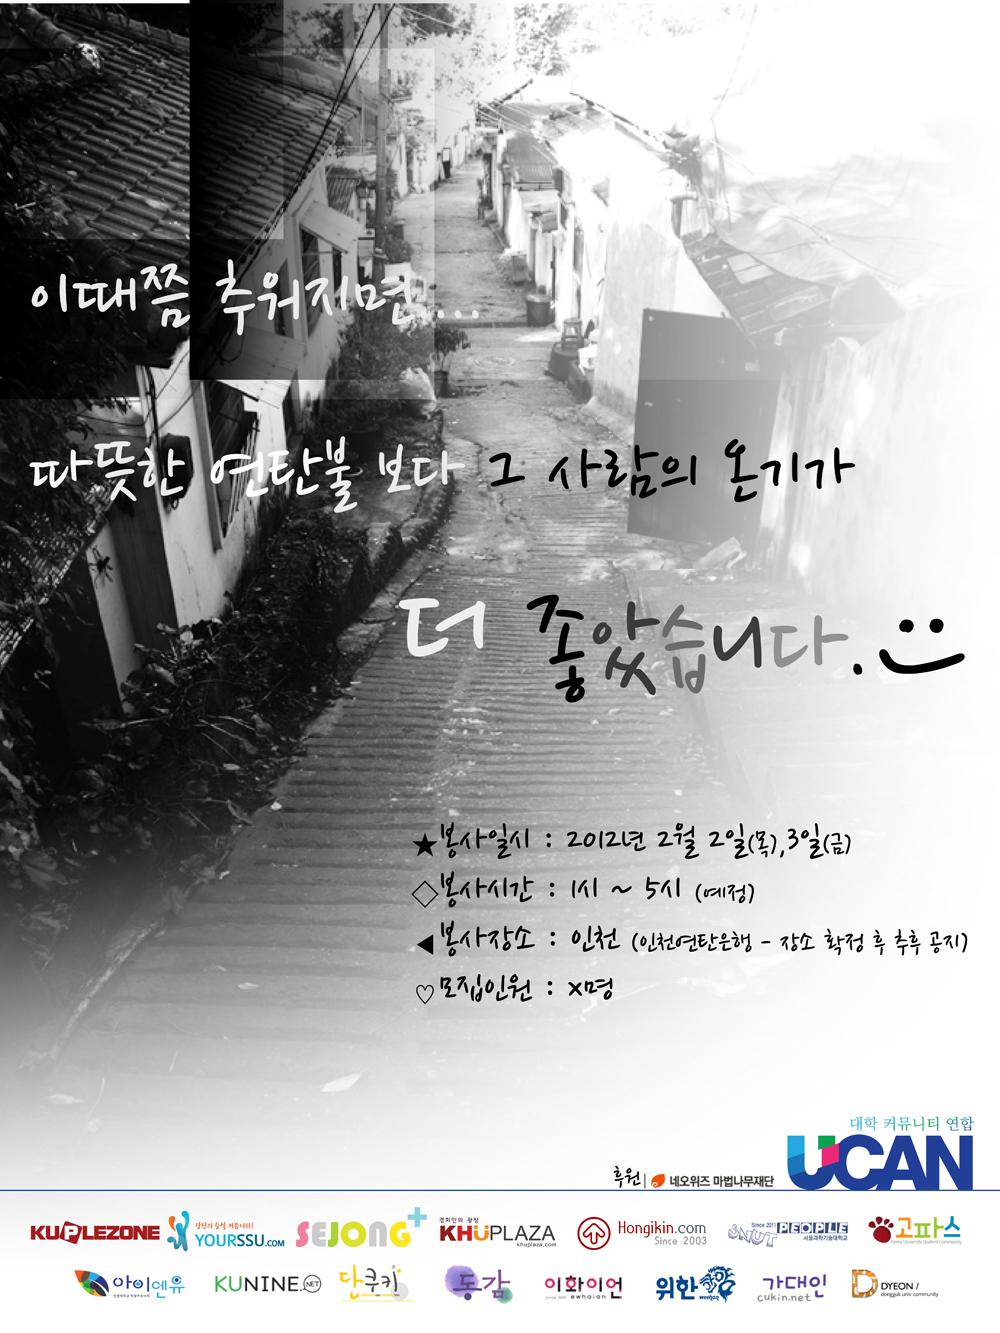 ucan-게시글-01.jpg